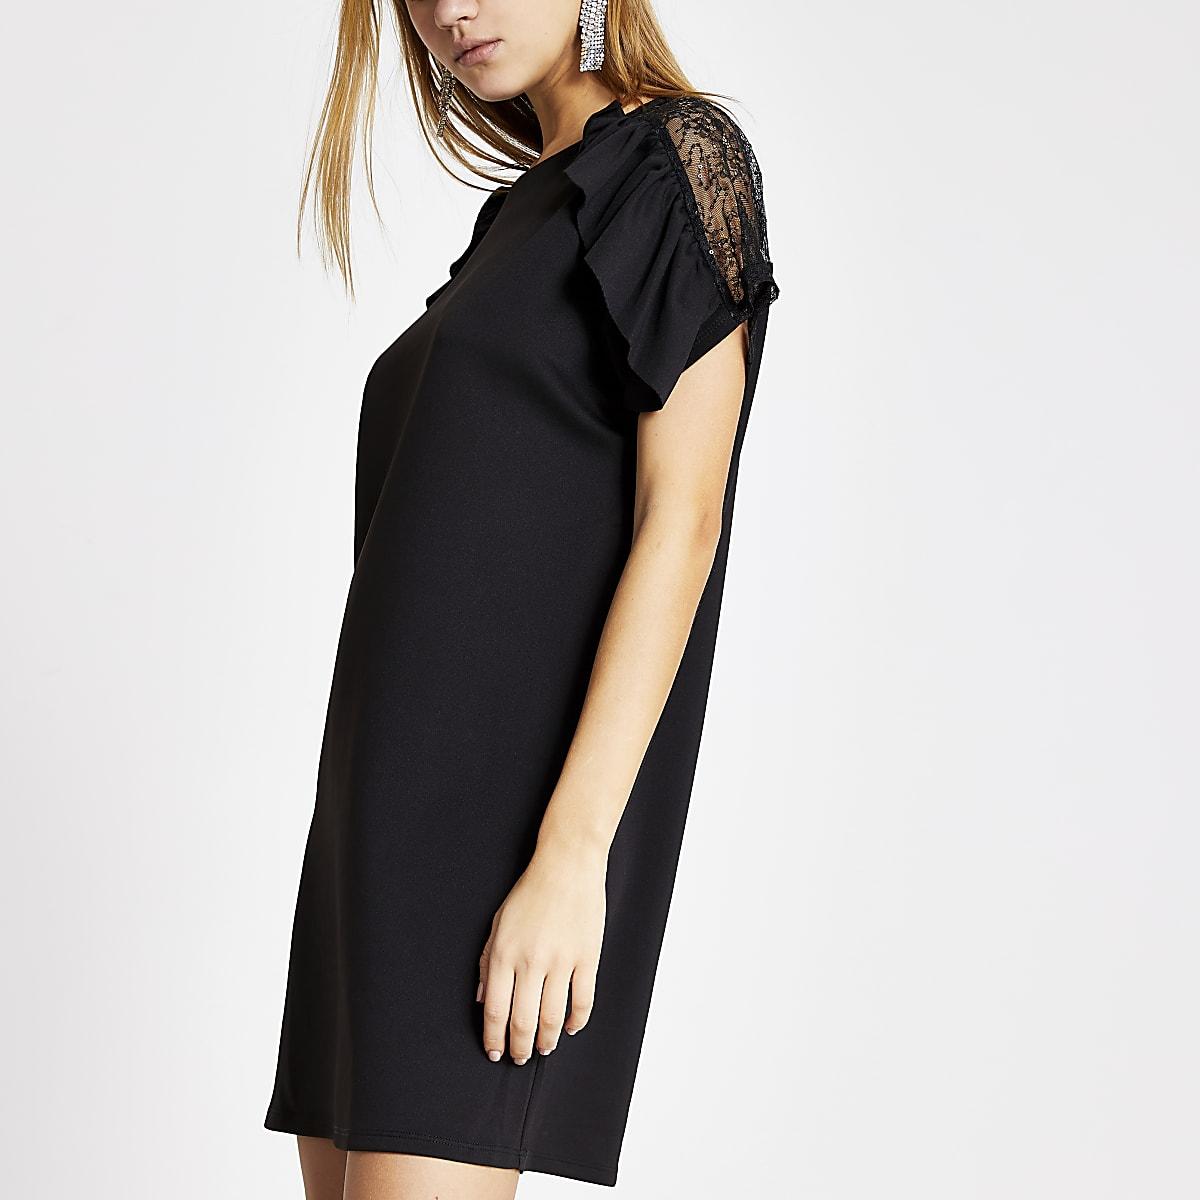 Black ruffle lace short sleeve dress